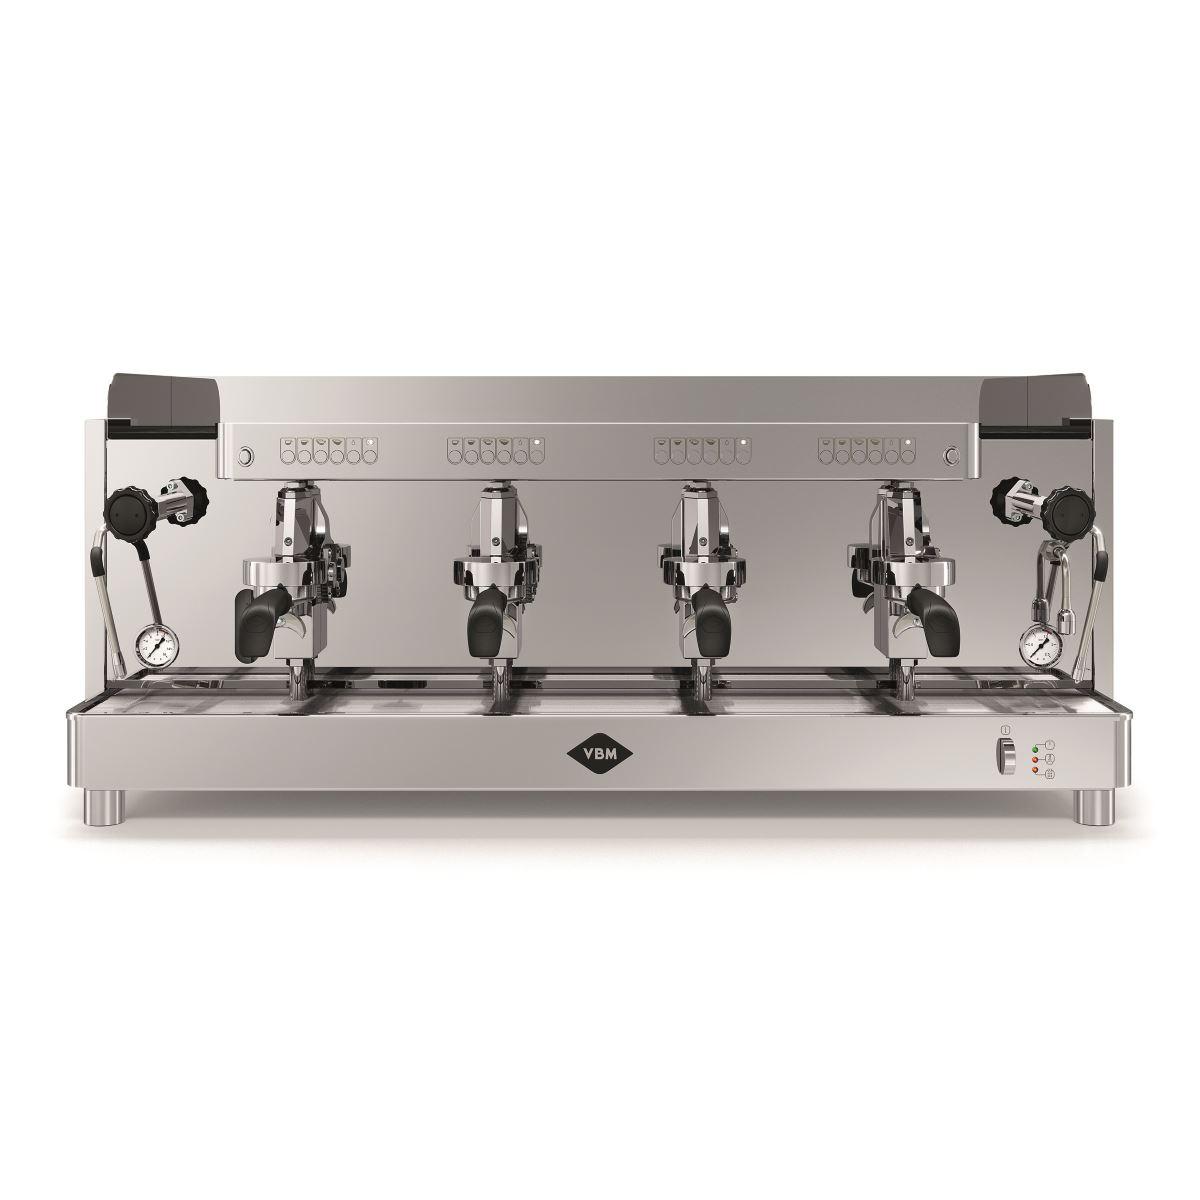 Espressor profesional Vibiemme Replica HX Elettronica, 4 grupuri